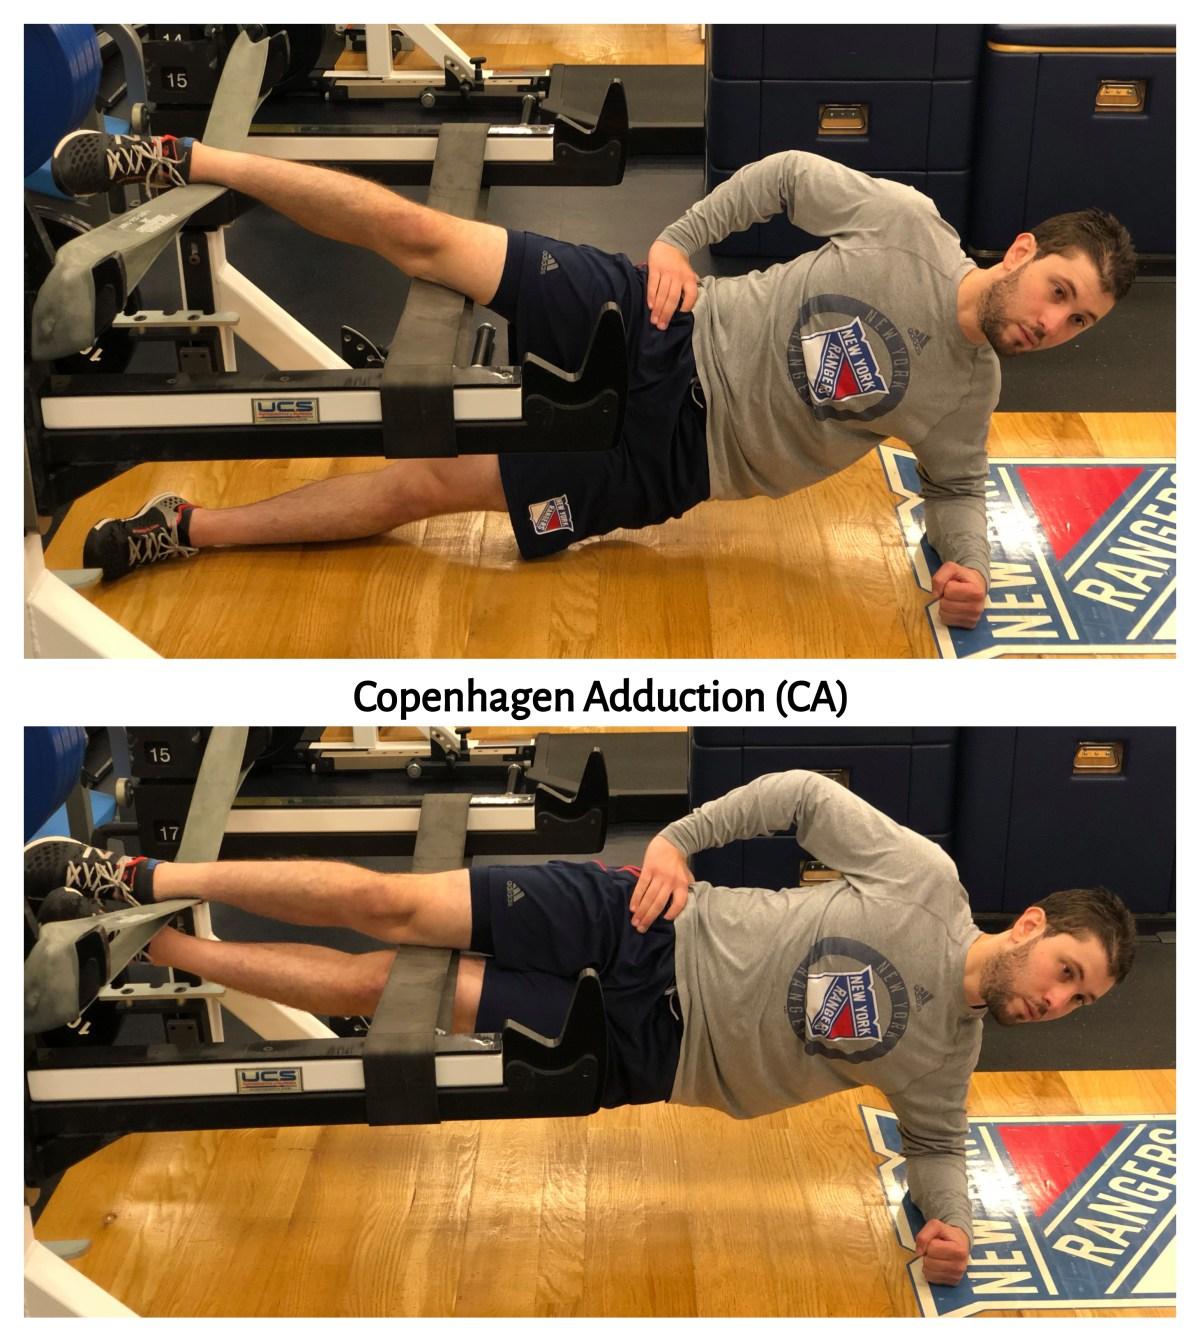 Hip-adduction-exercises-copenhagen-adductor-exercise